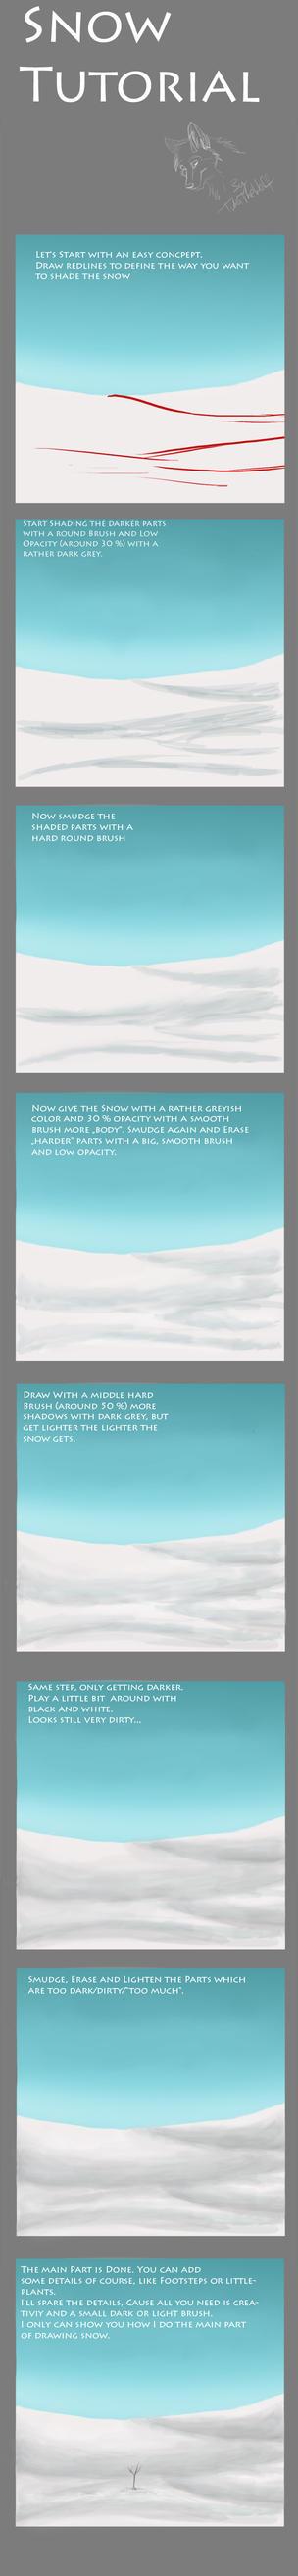 Snow Tutorial by TukaTheWolf